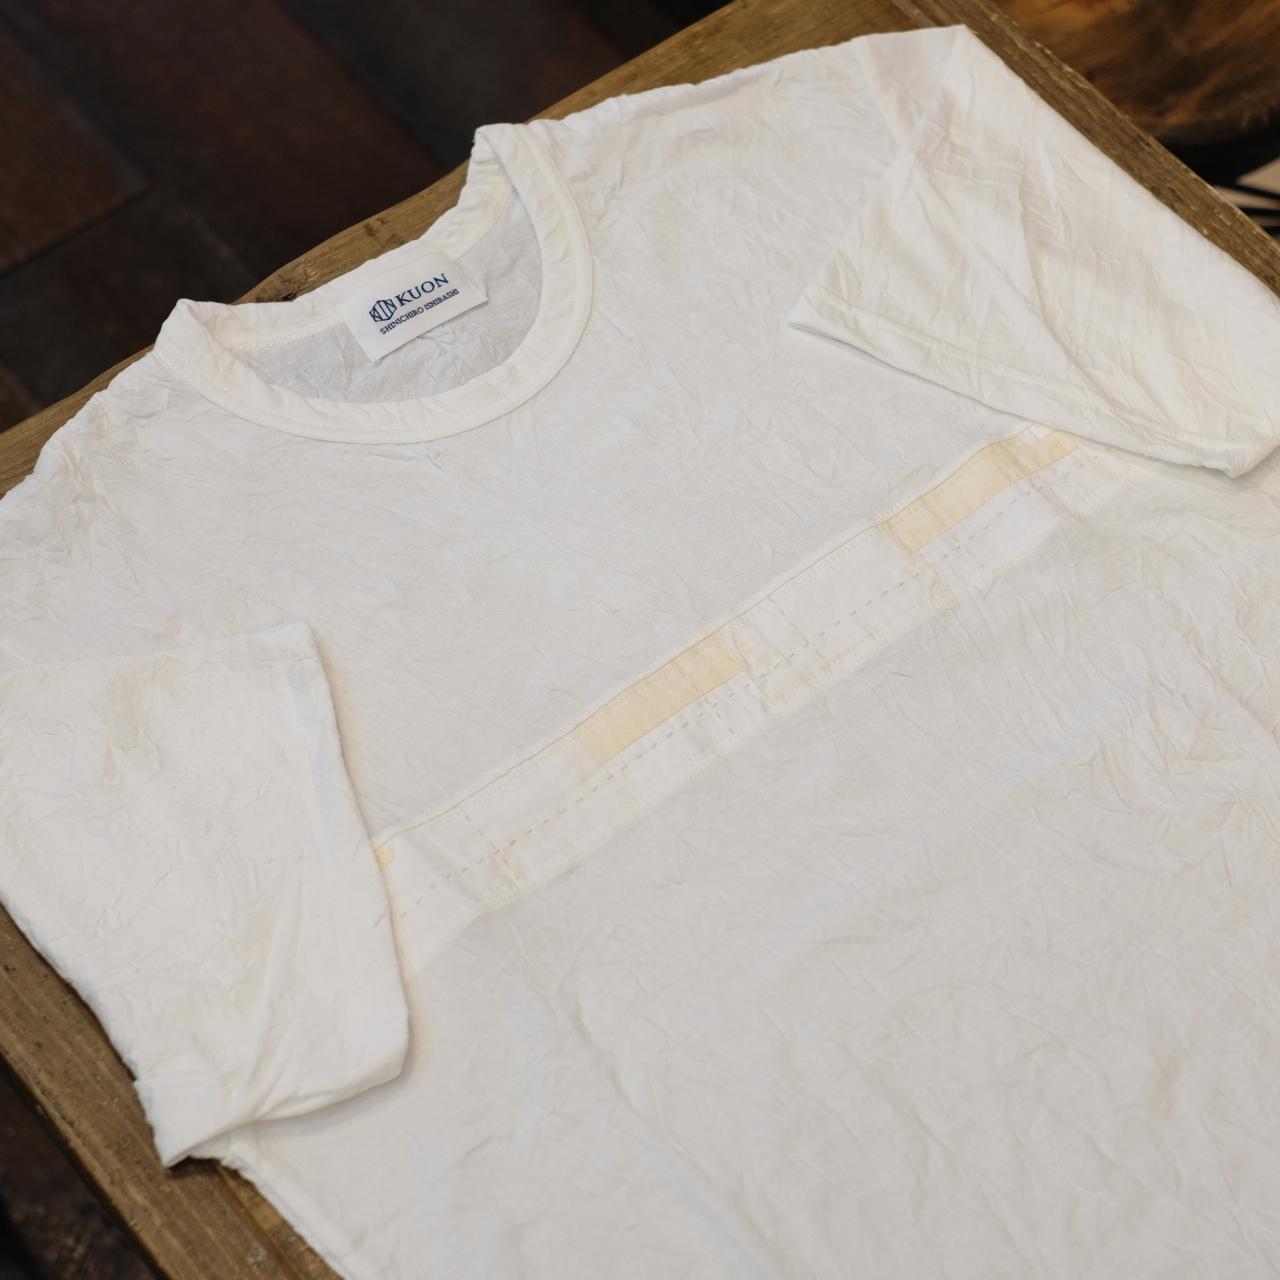 KUON(クオン) ラインアップサイクル襤褸 リンクルTシャツ ホワイト